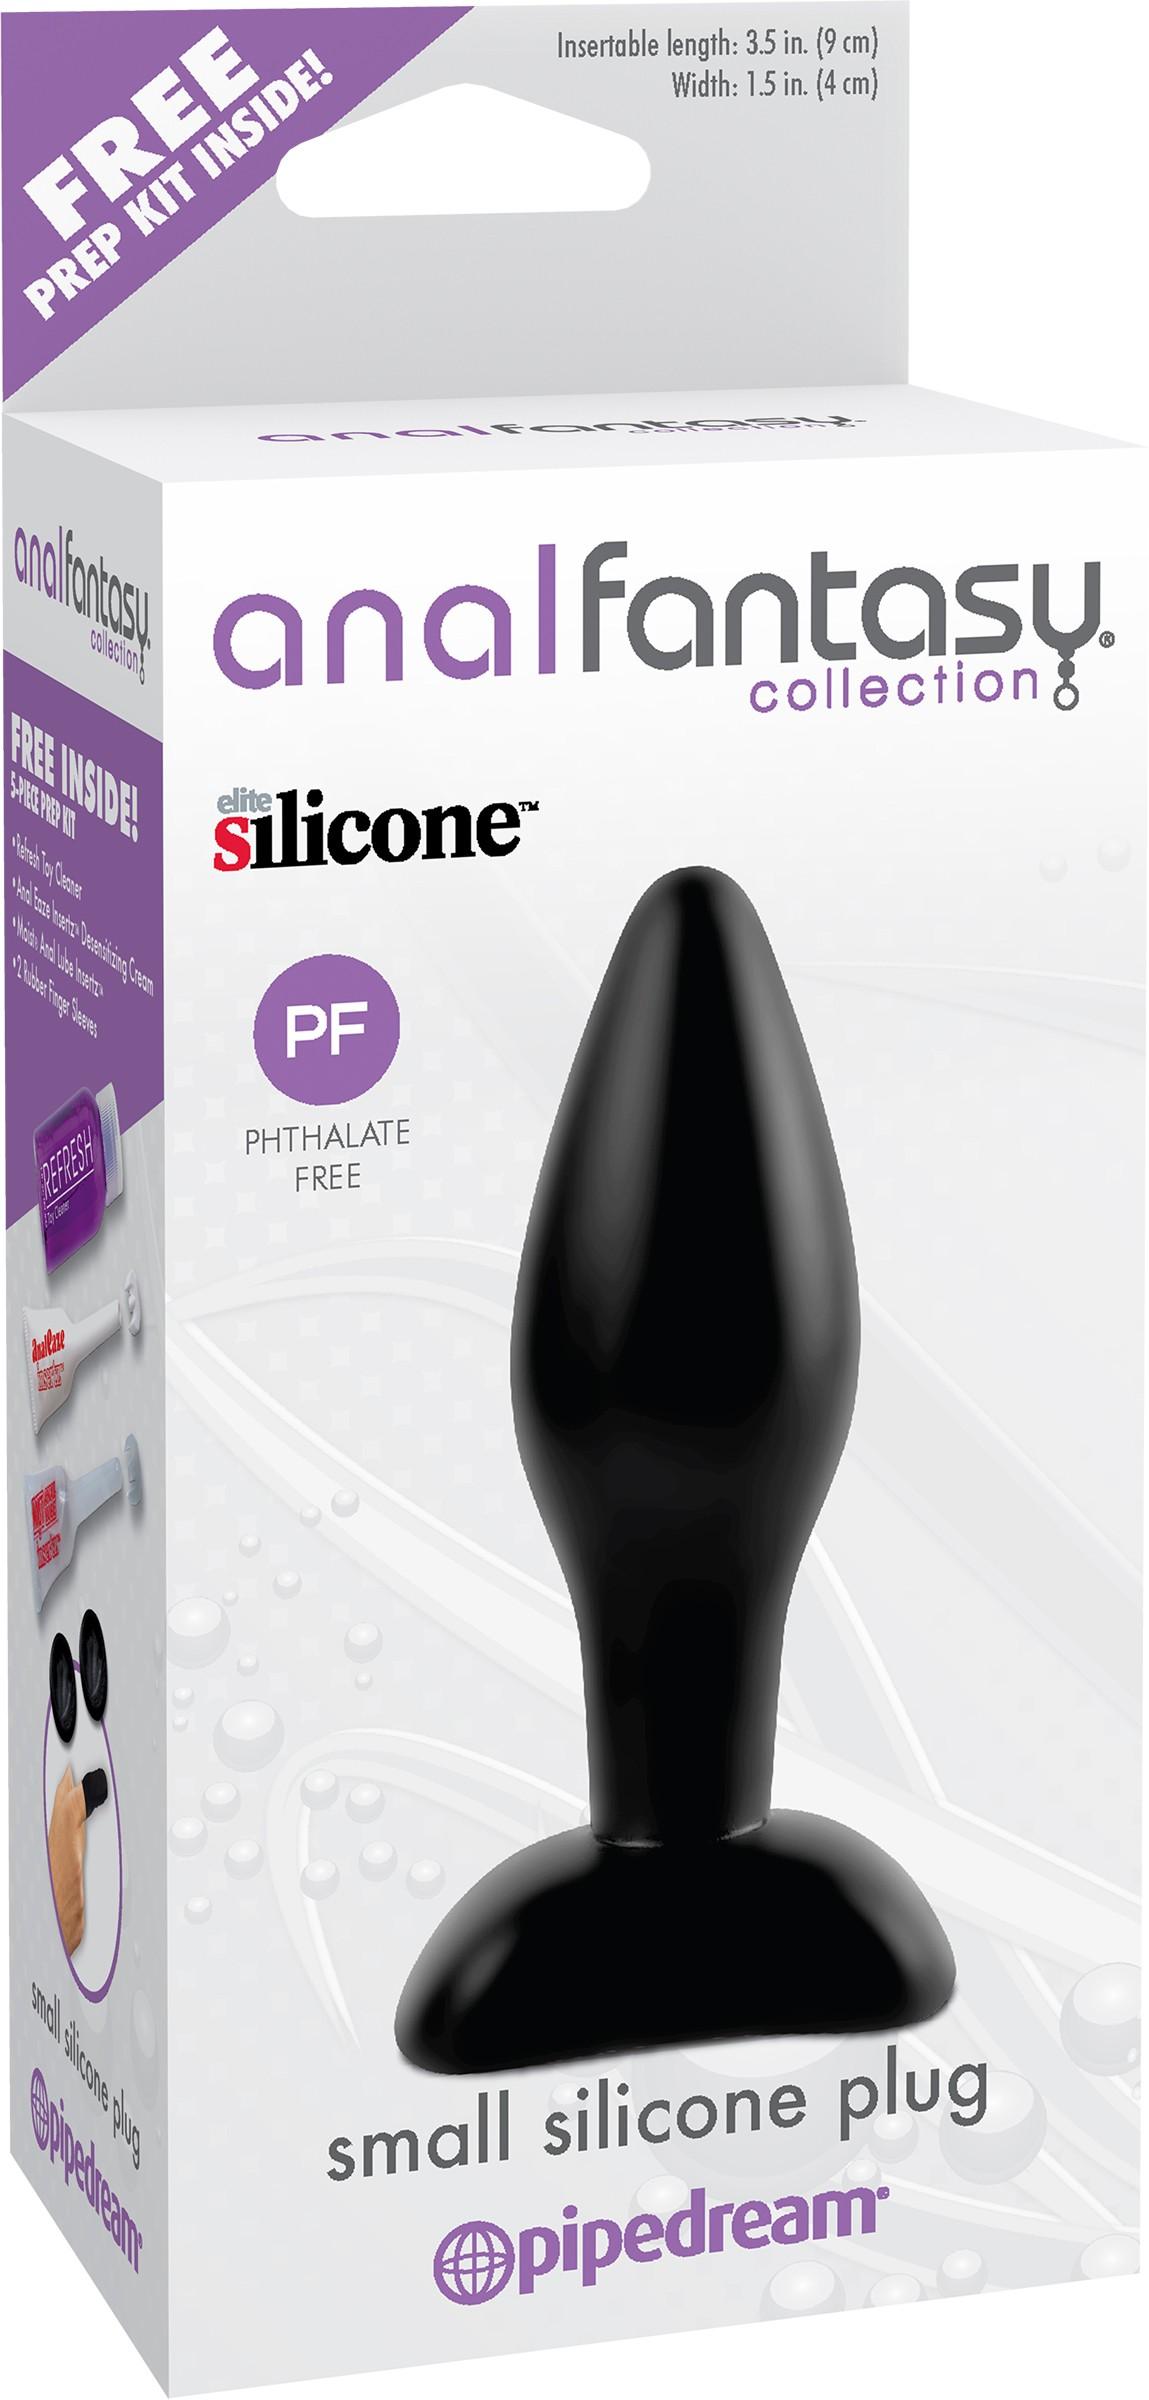 SO ANAL FANTASY COLLECTION SMALL SILICONE PLUG